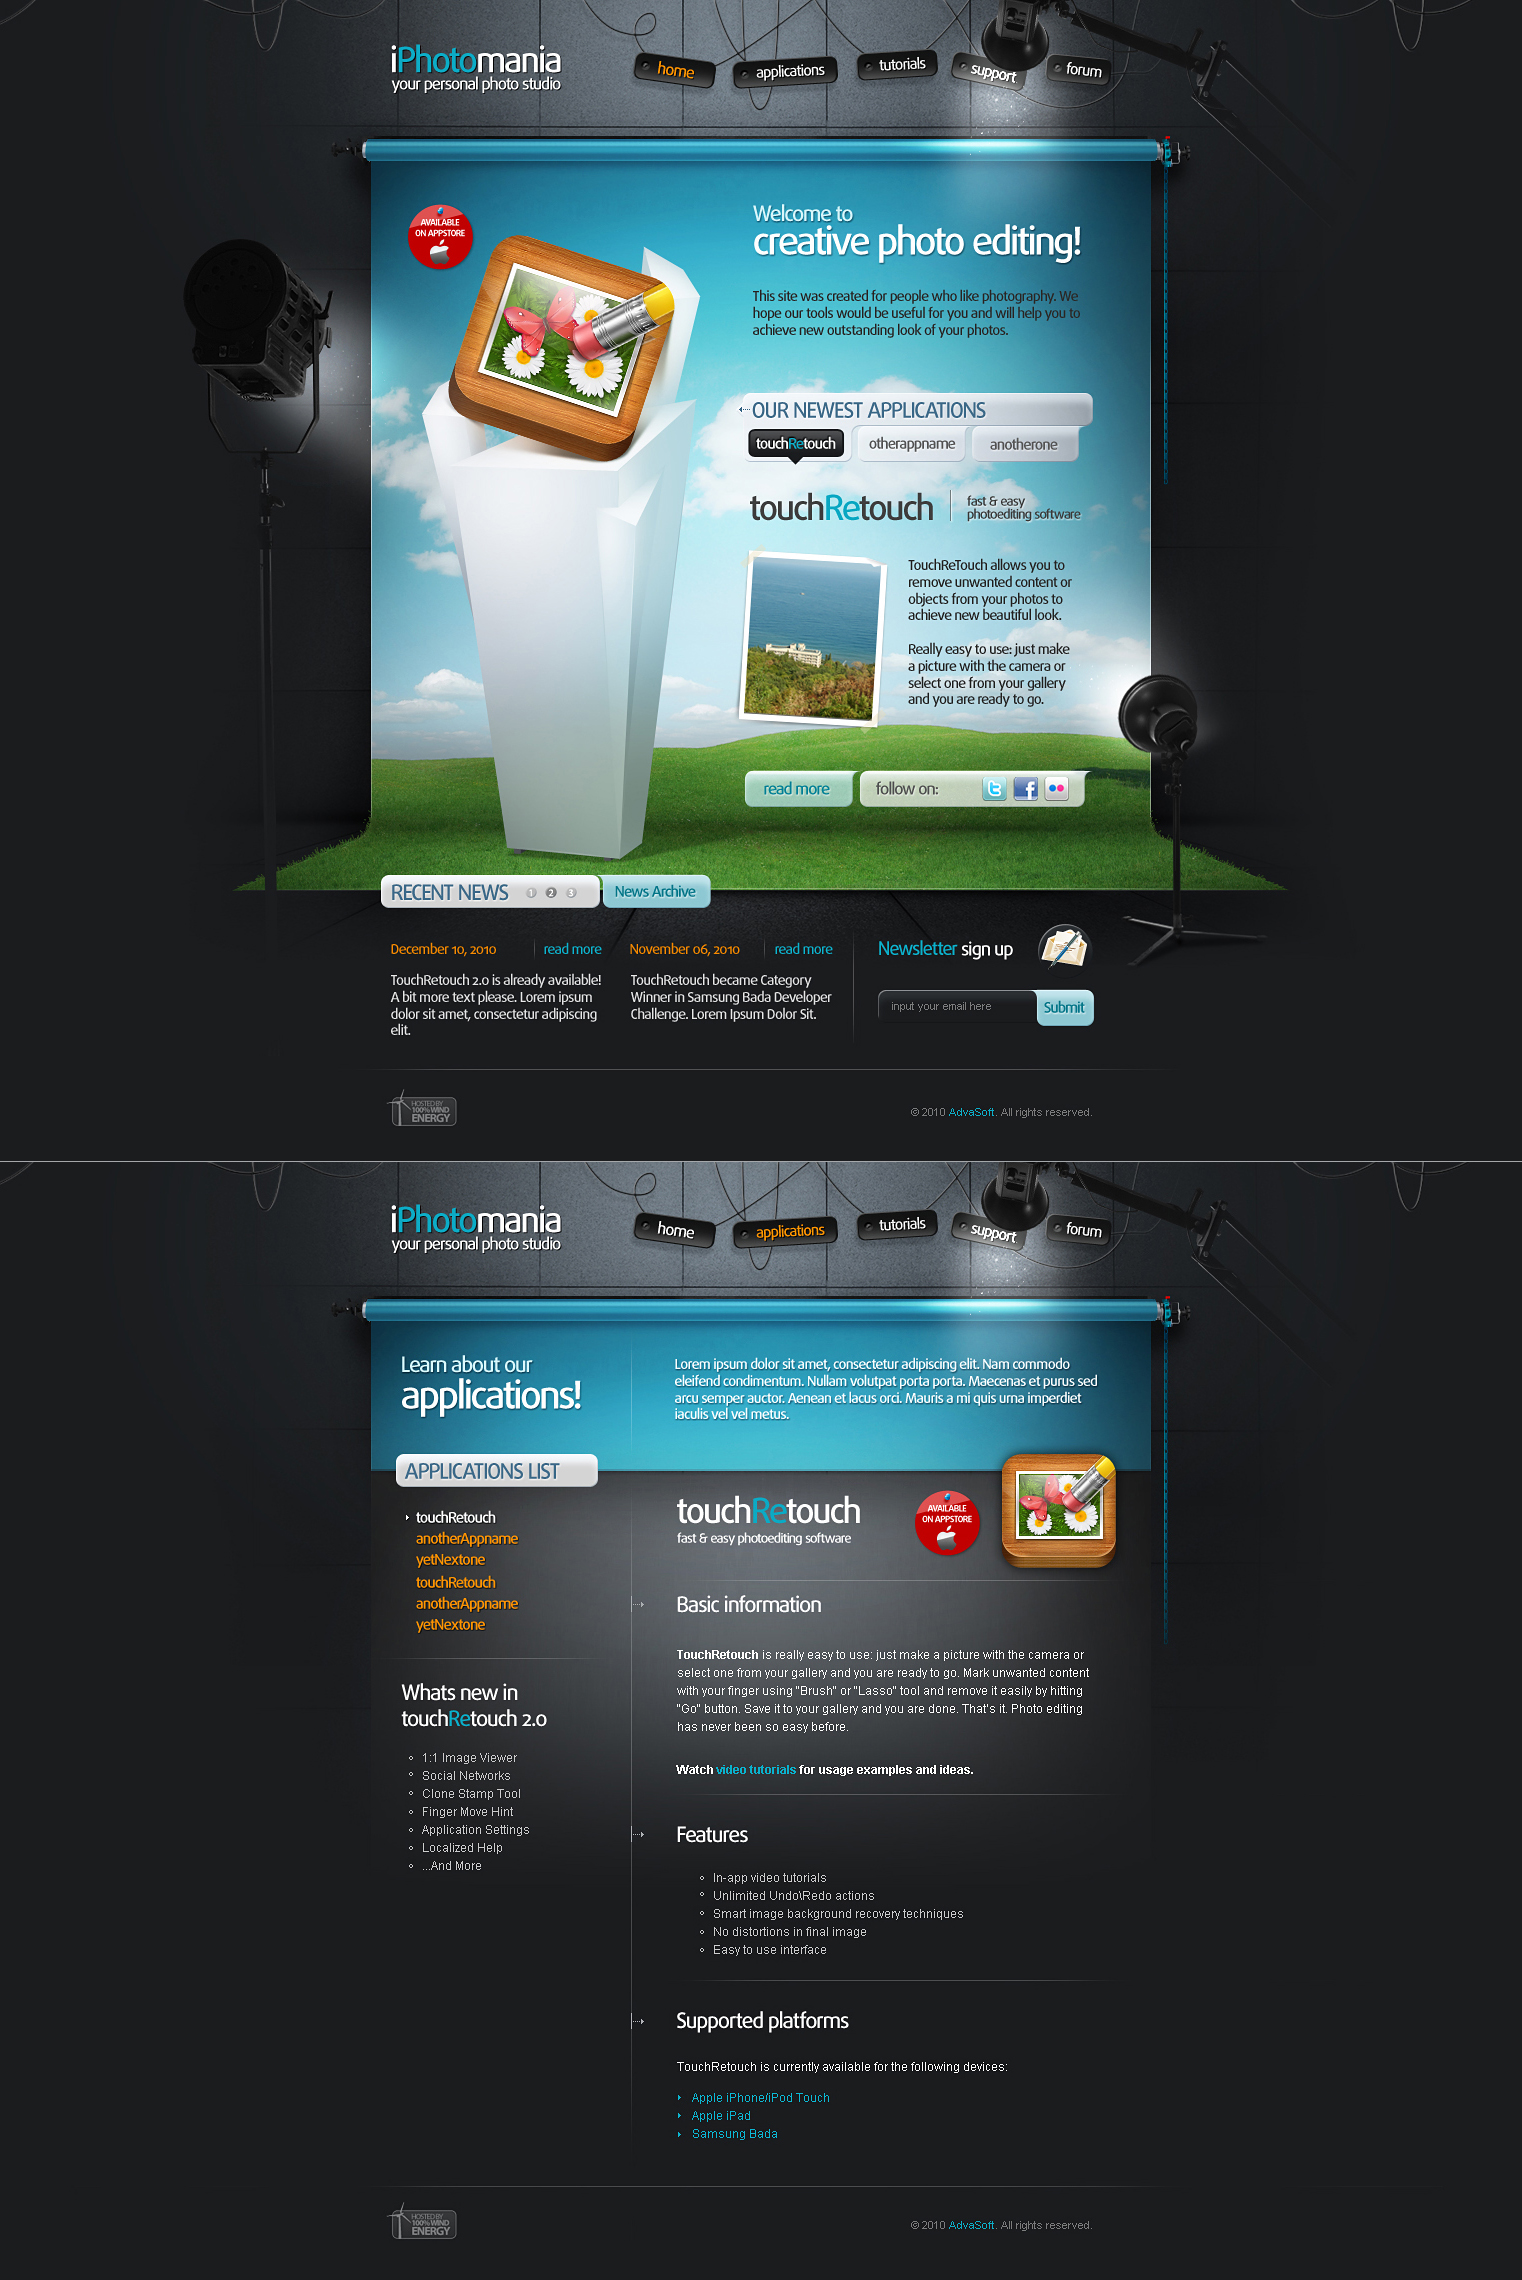 iphotomania website